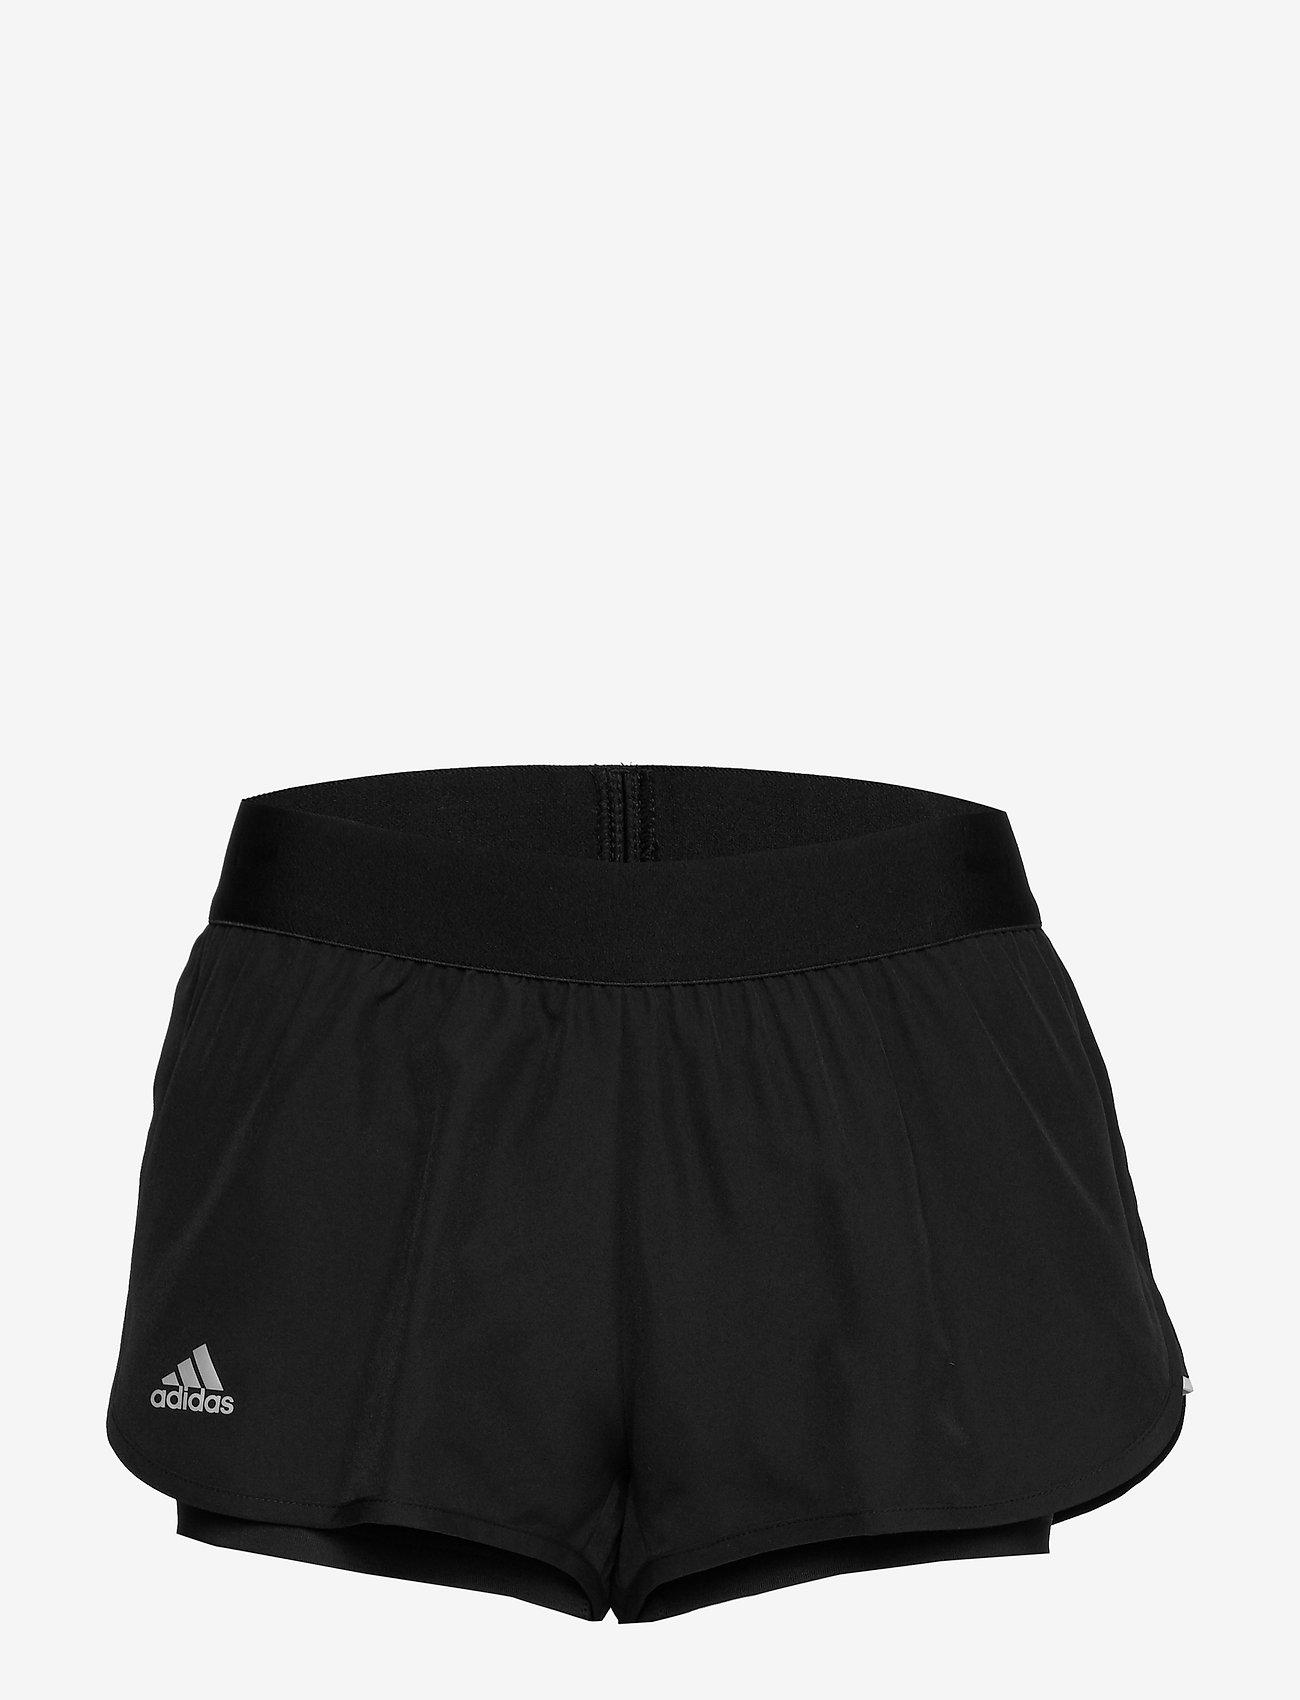 adidas Tennis - CLUB SHORT - spodenki treningowe - black - 1